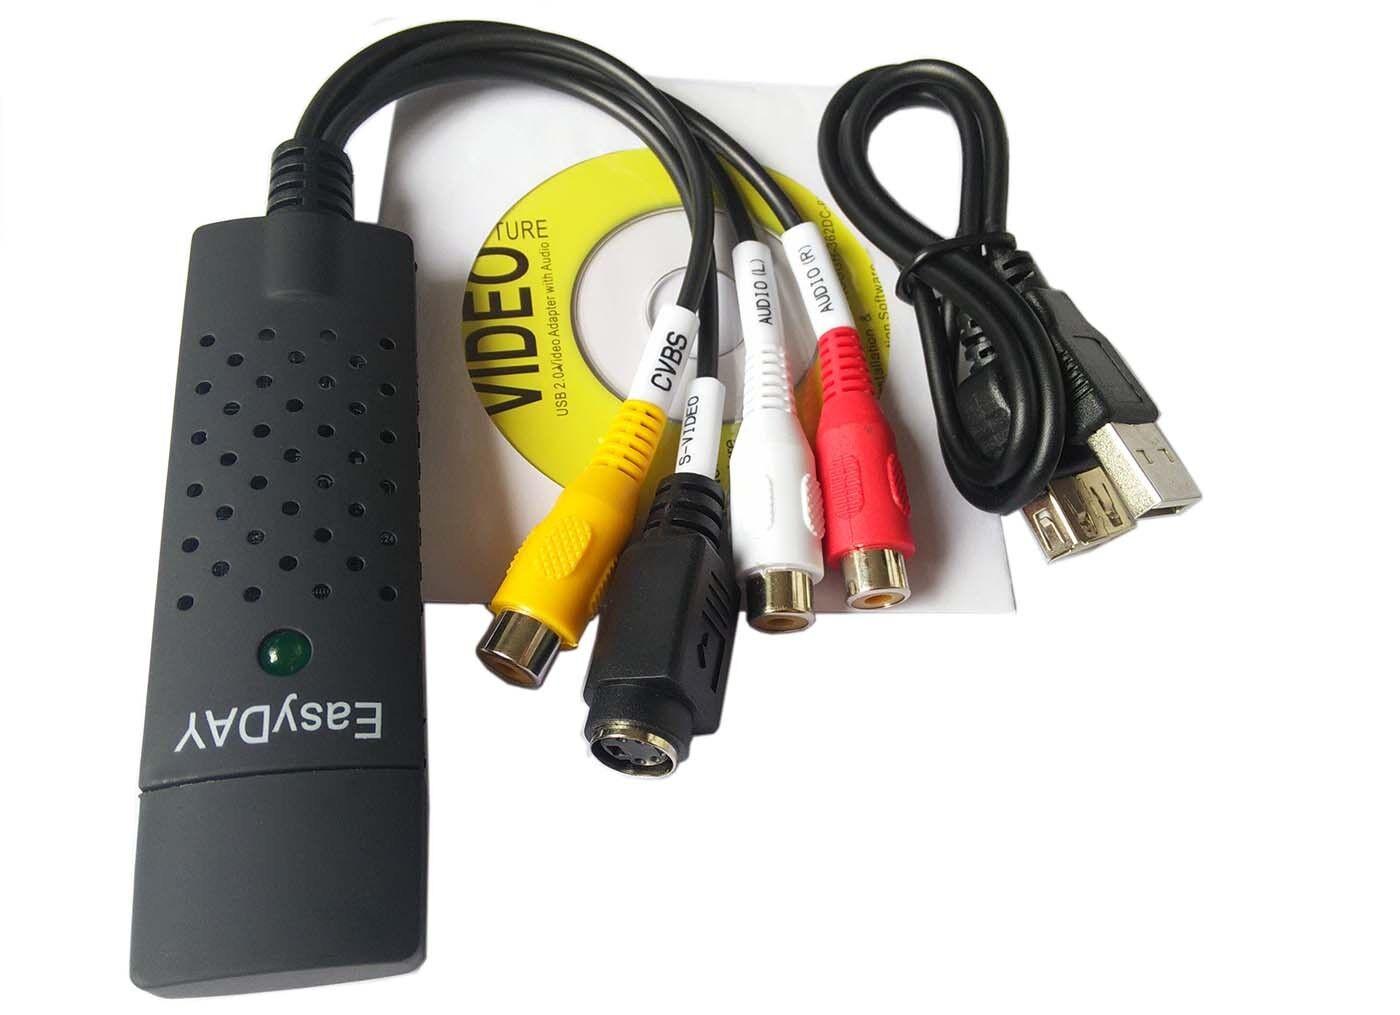 EasyCap DC60 USB Video Capture Card Adapter with ChipSet UTV